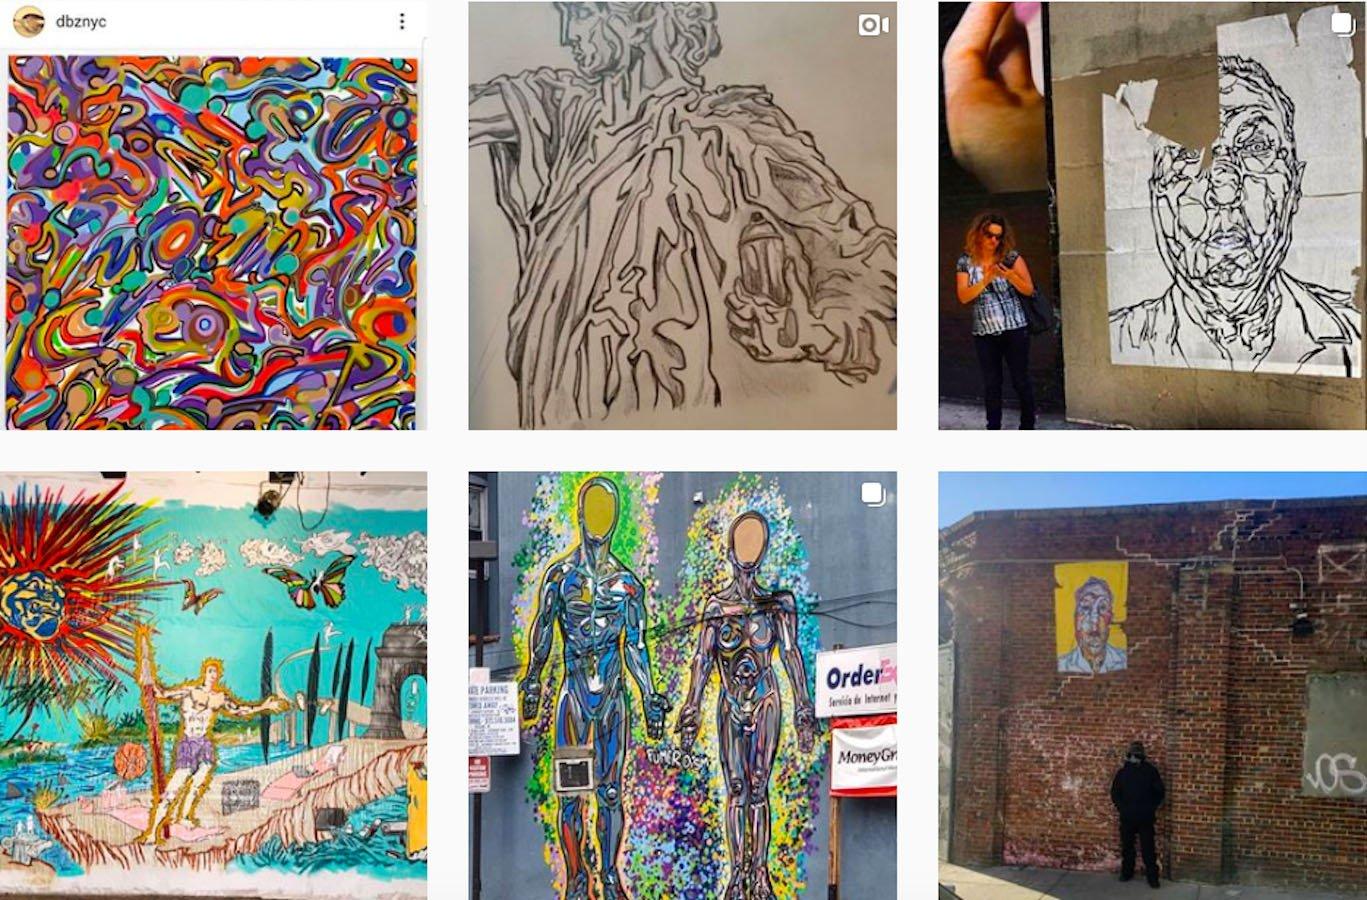 Web Design Inspiration: 110+ Accounts On Instagram and 10+ Best UX & Web Design Books in 2020 - fumeroism